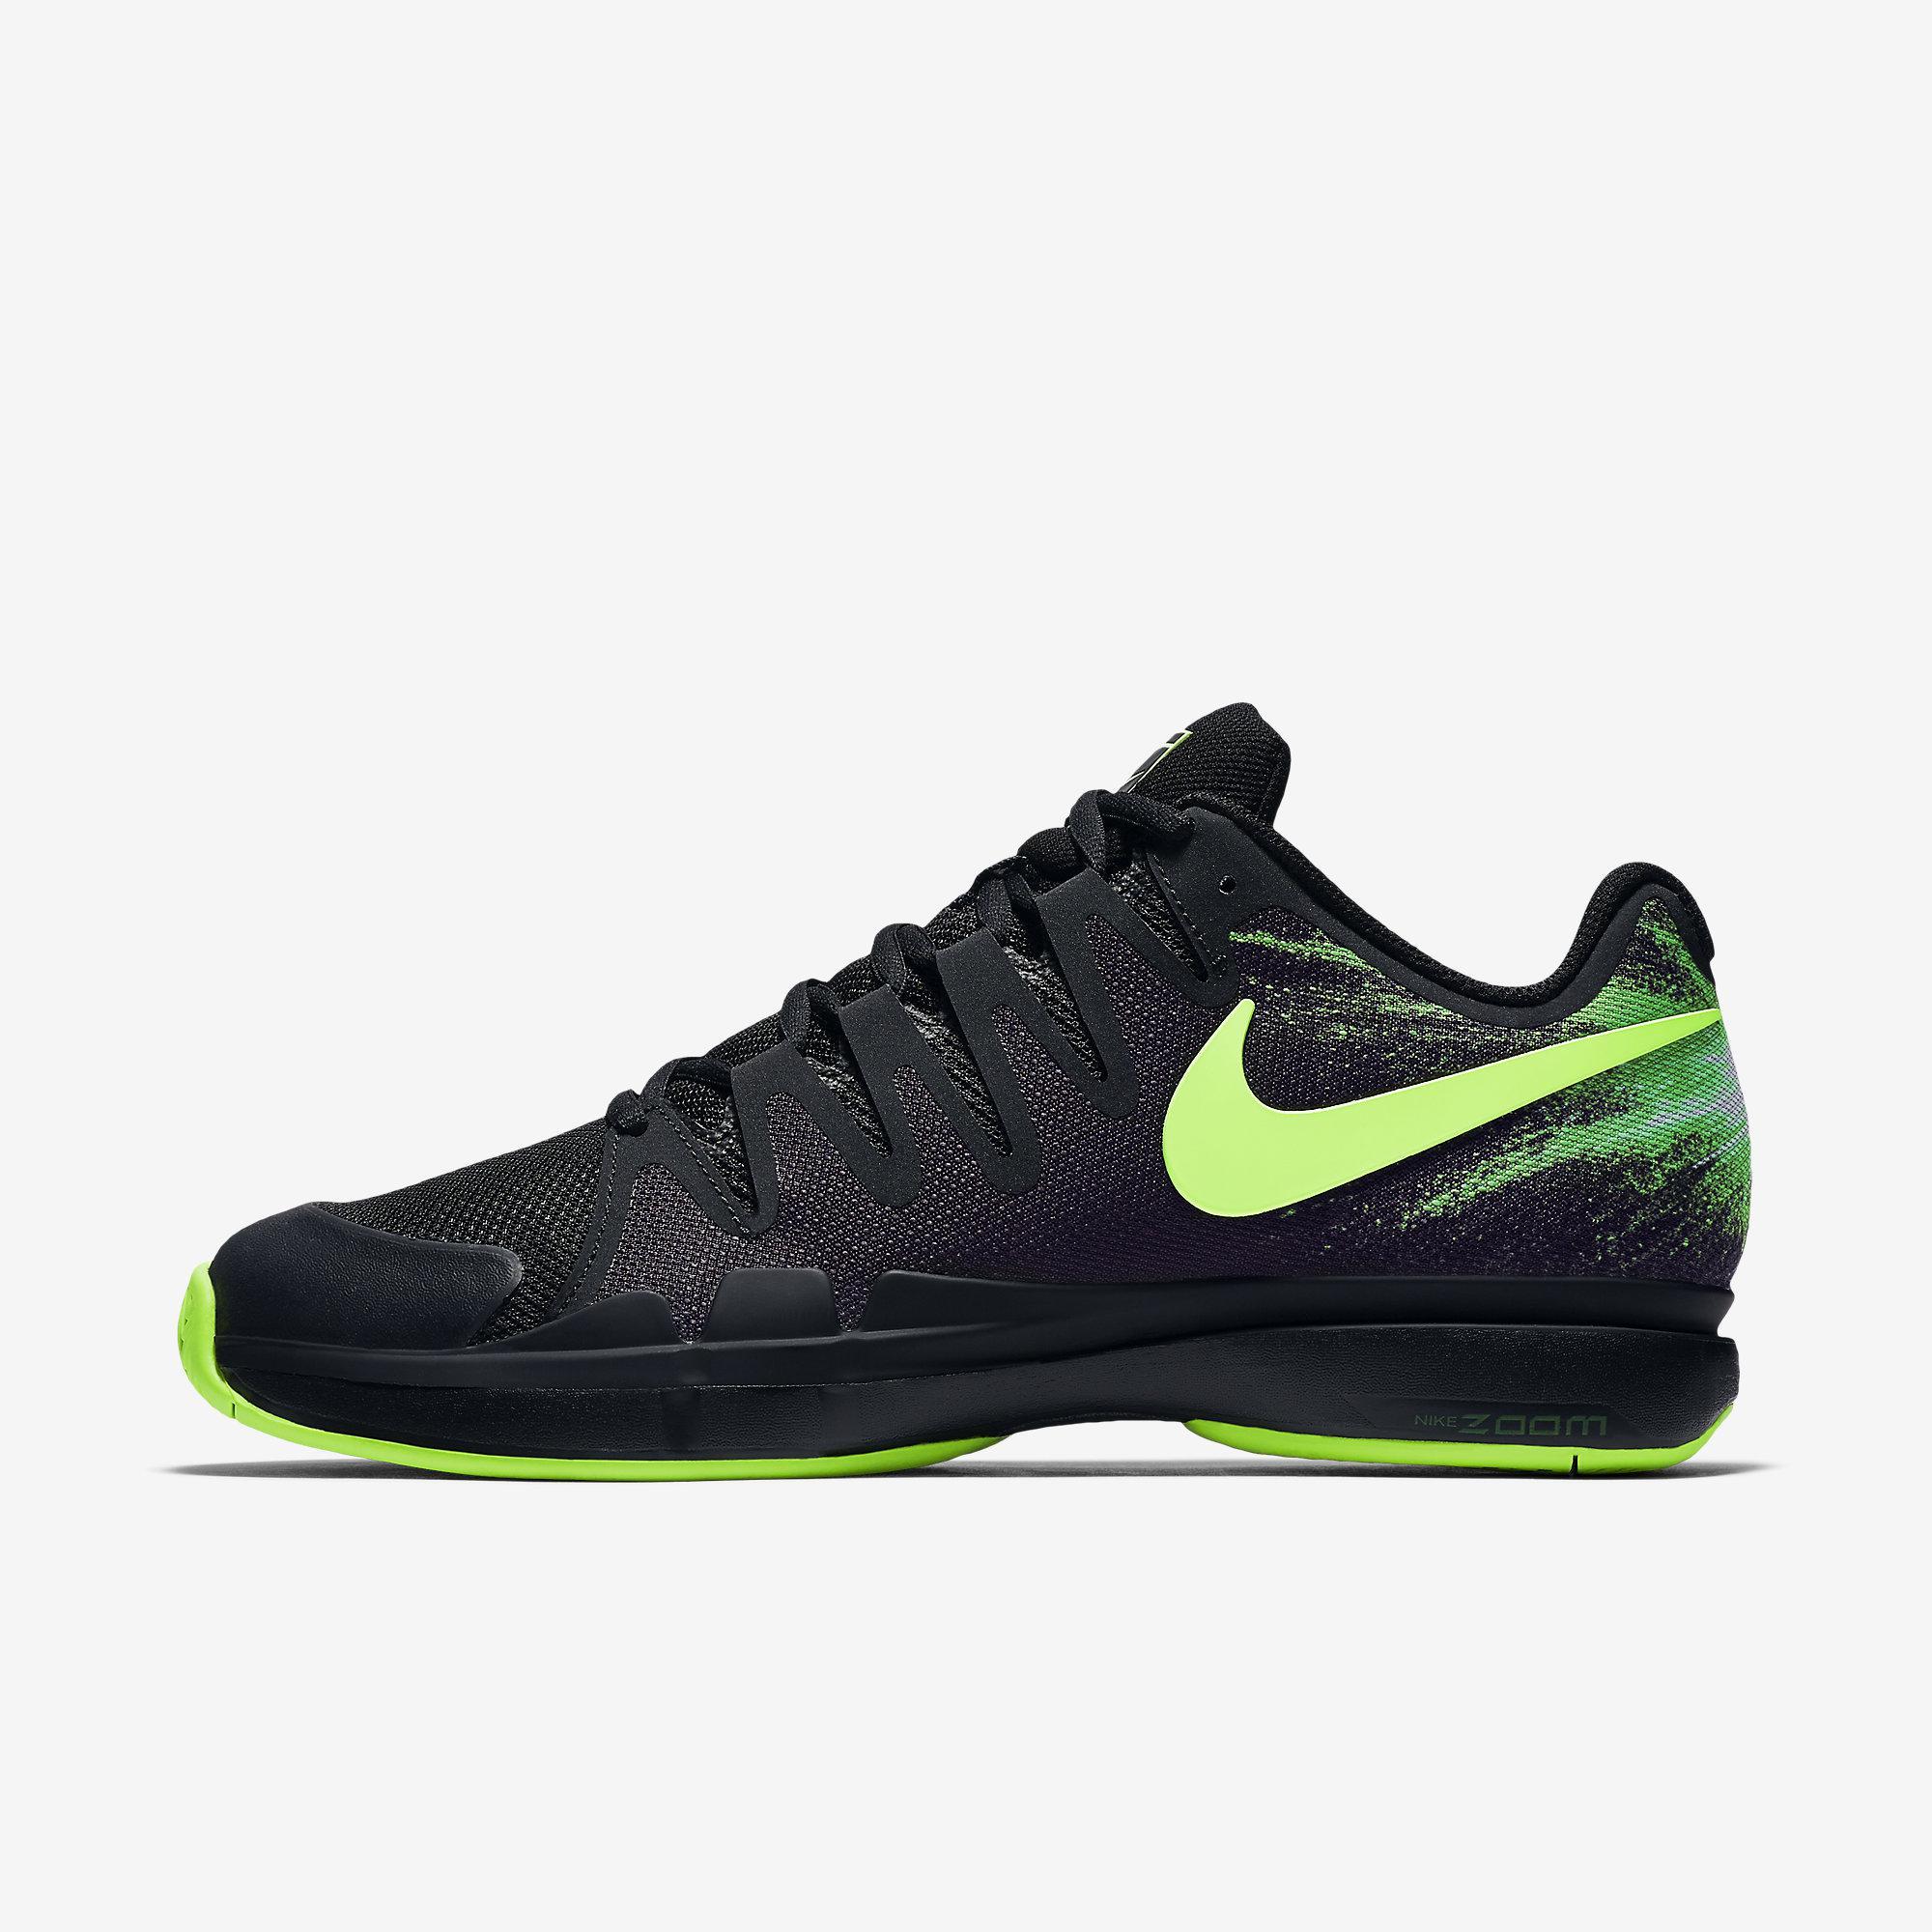 Nike Mens Zoom Vapor 9.5 Tour QS Tennis